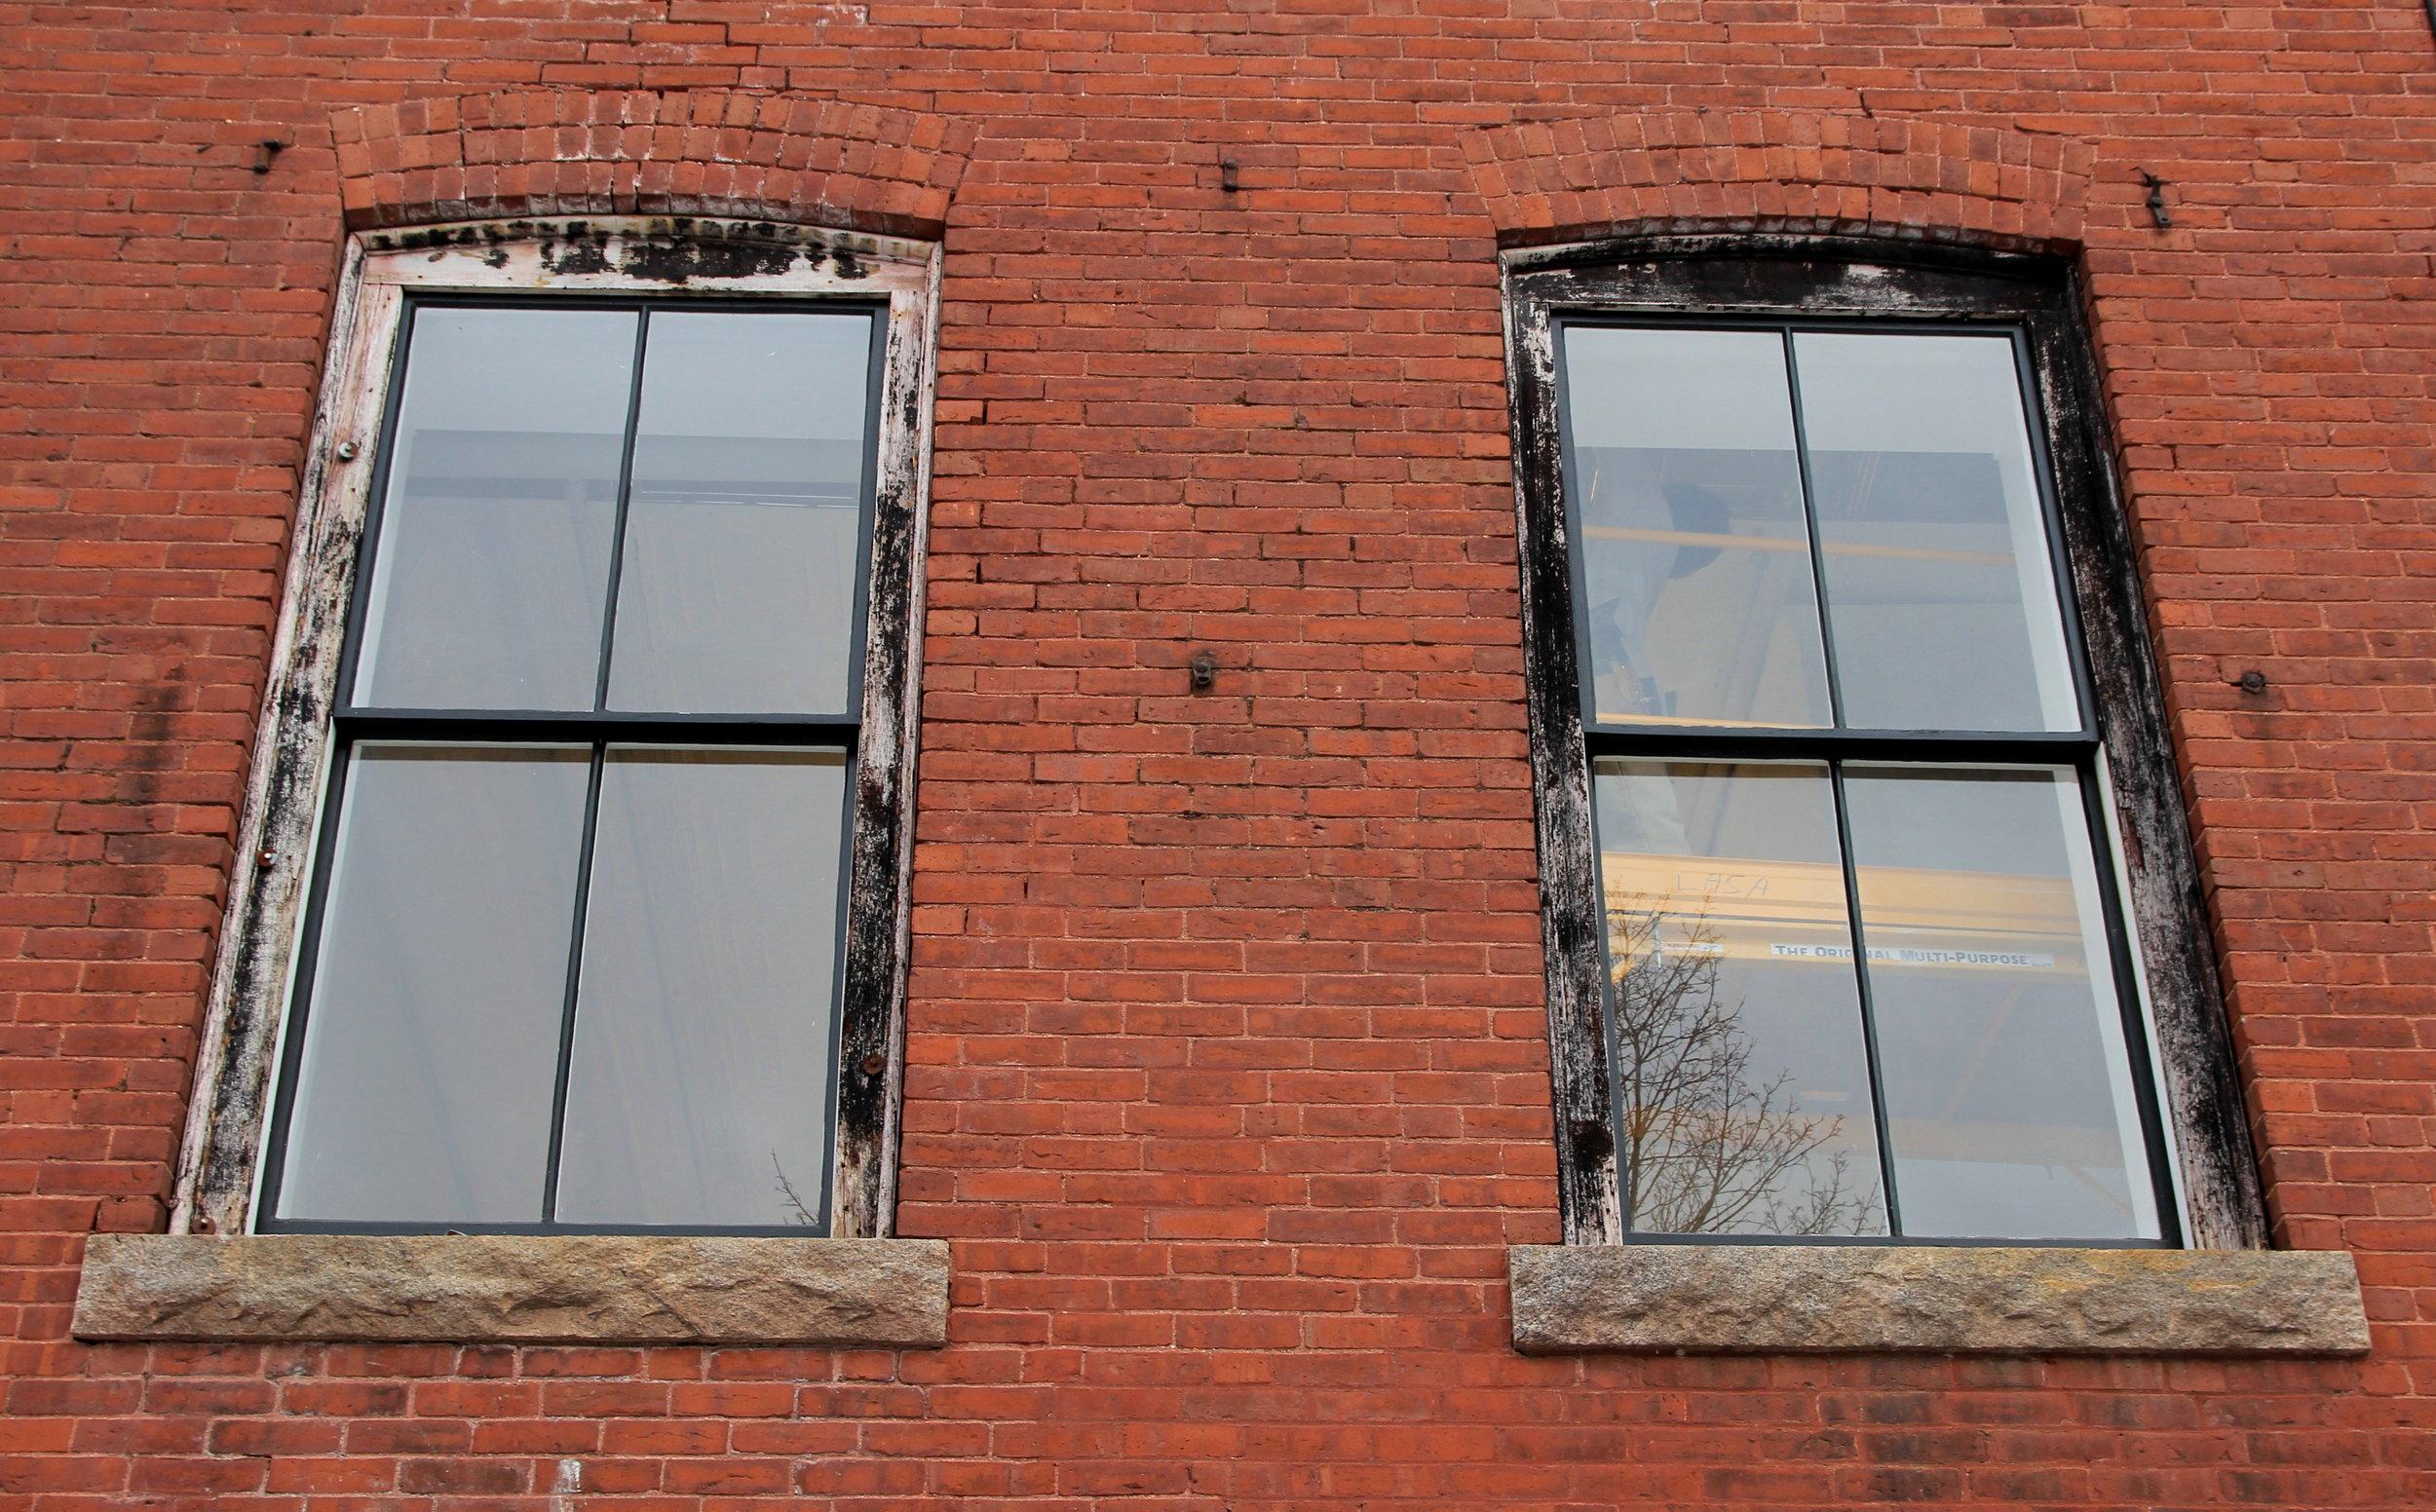 Jan 24 new 1st floor windows, trim will be painted in the Spring.jpg